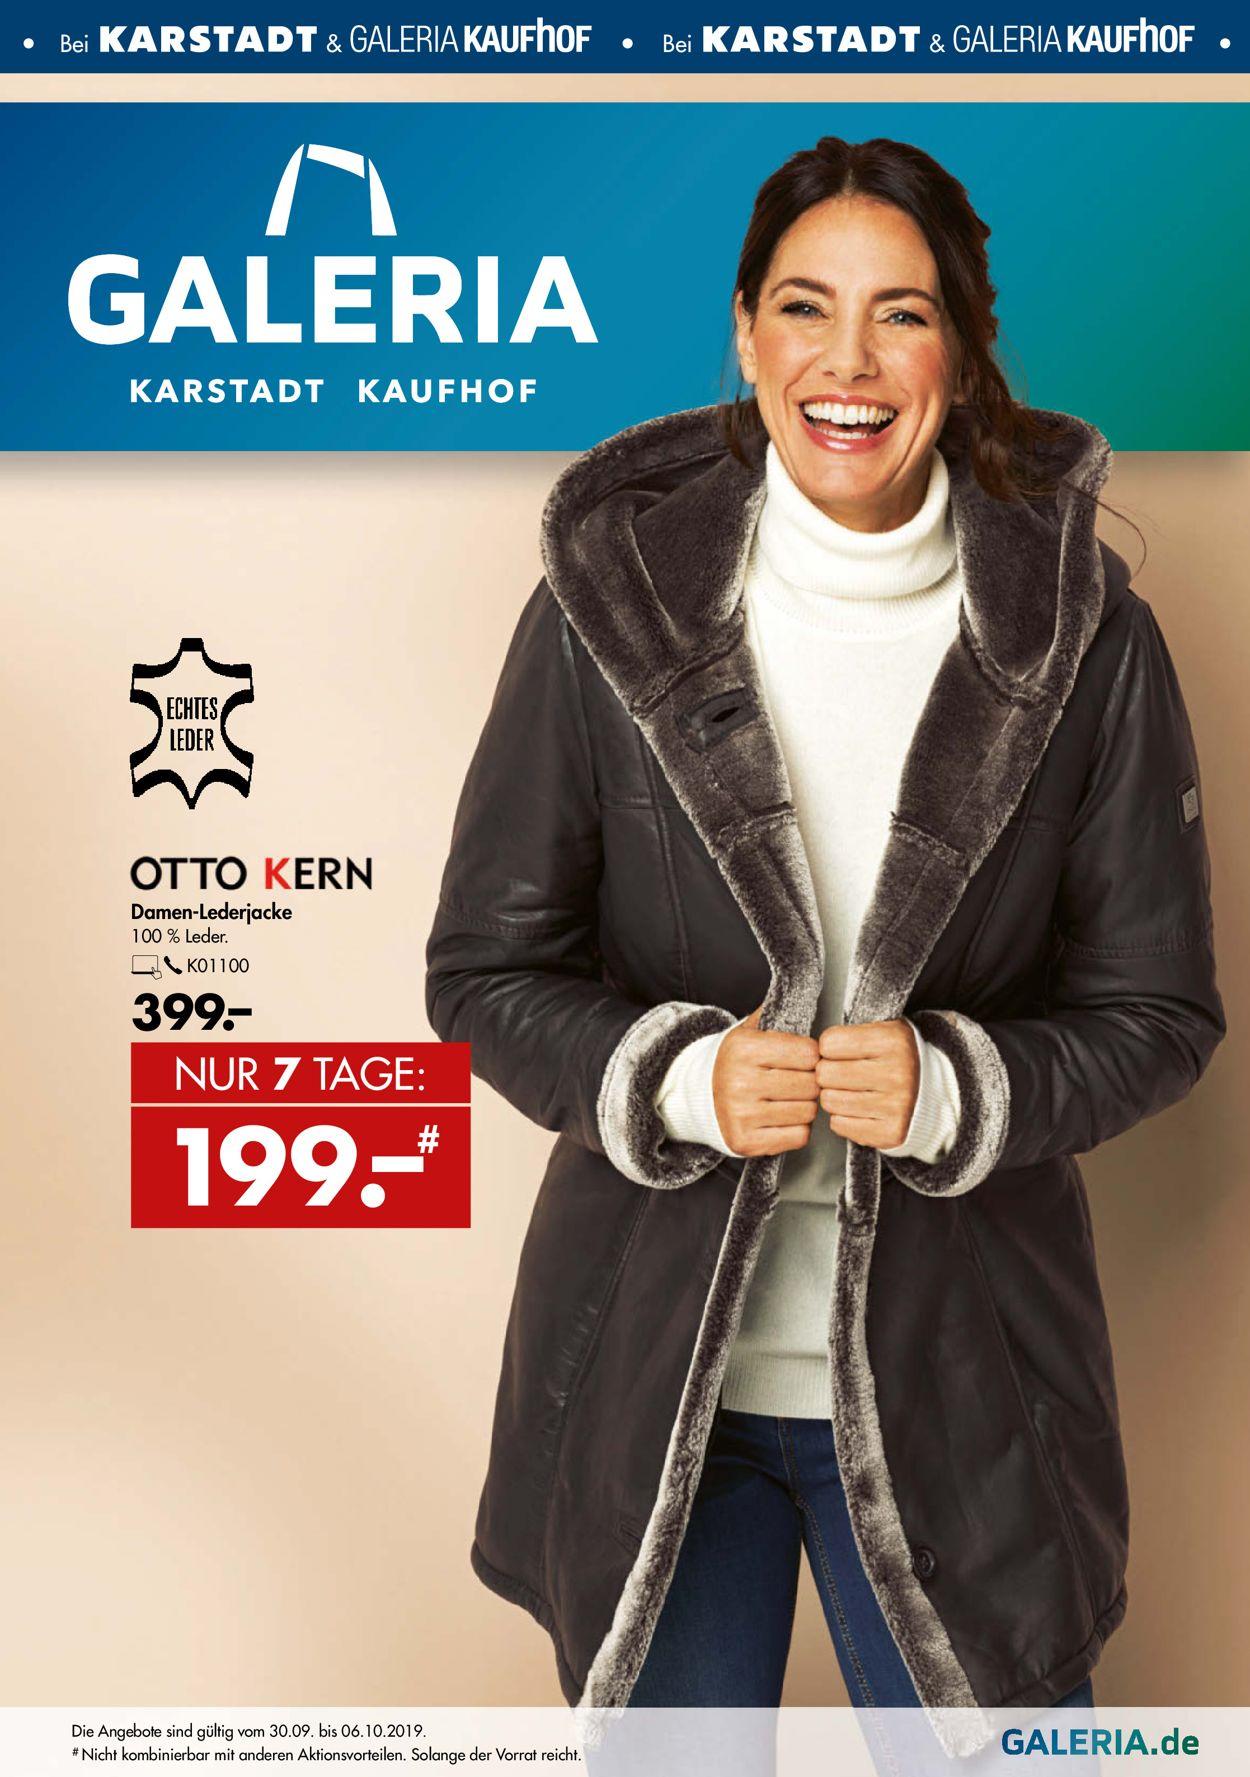 Super Specials am besten geliebt Beste GALERIA Kaufhof Aktueller Prospekt 30.09 - 09.10.2019 ...